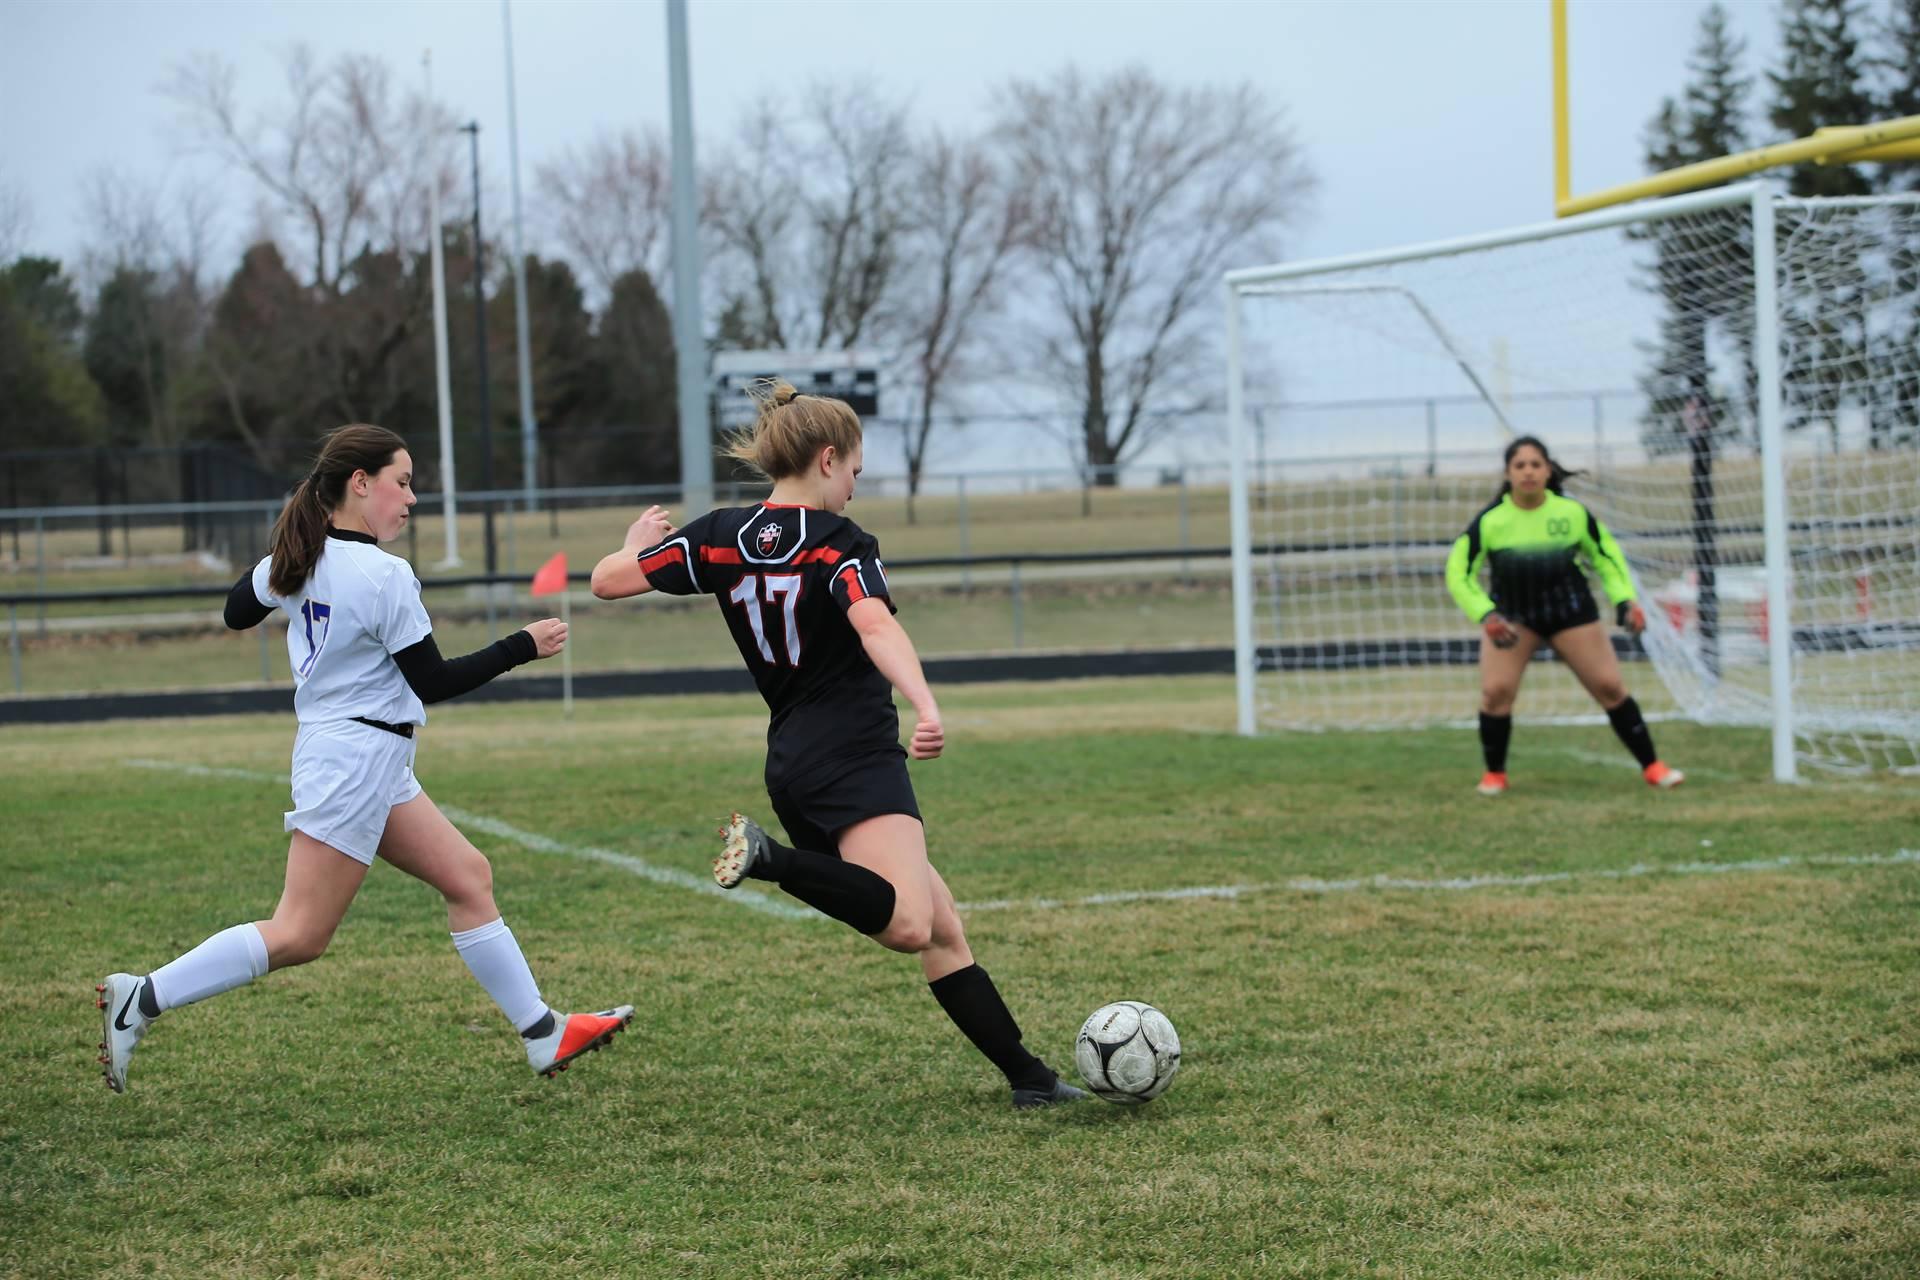 soccer player taking a shot on goal